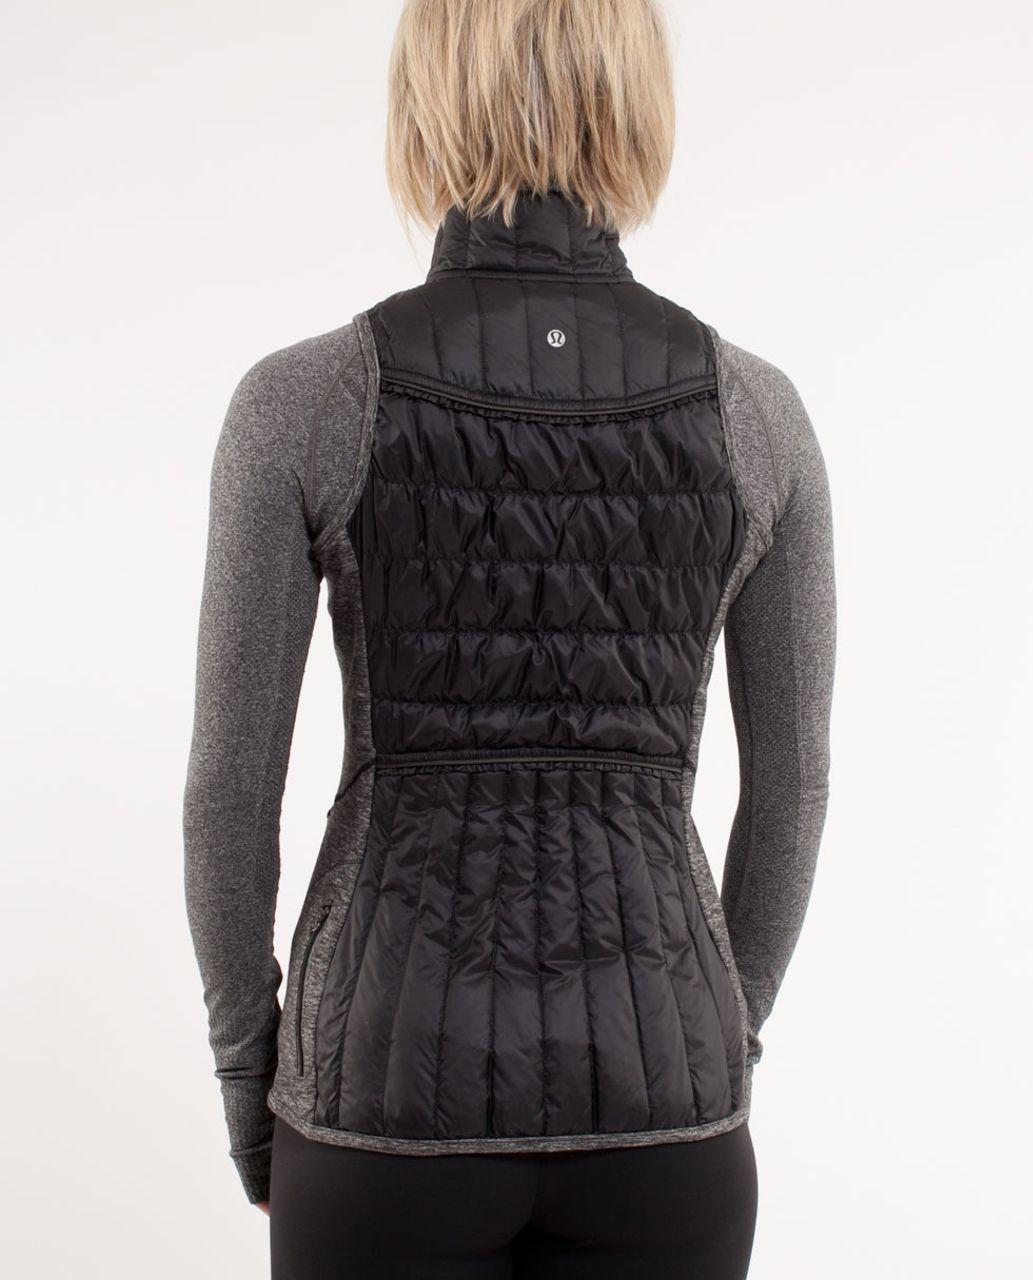 Lululemon Run:  Turn Around Vest - Black /  Heathered Black /  Grey Houndstooh